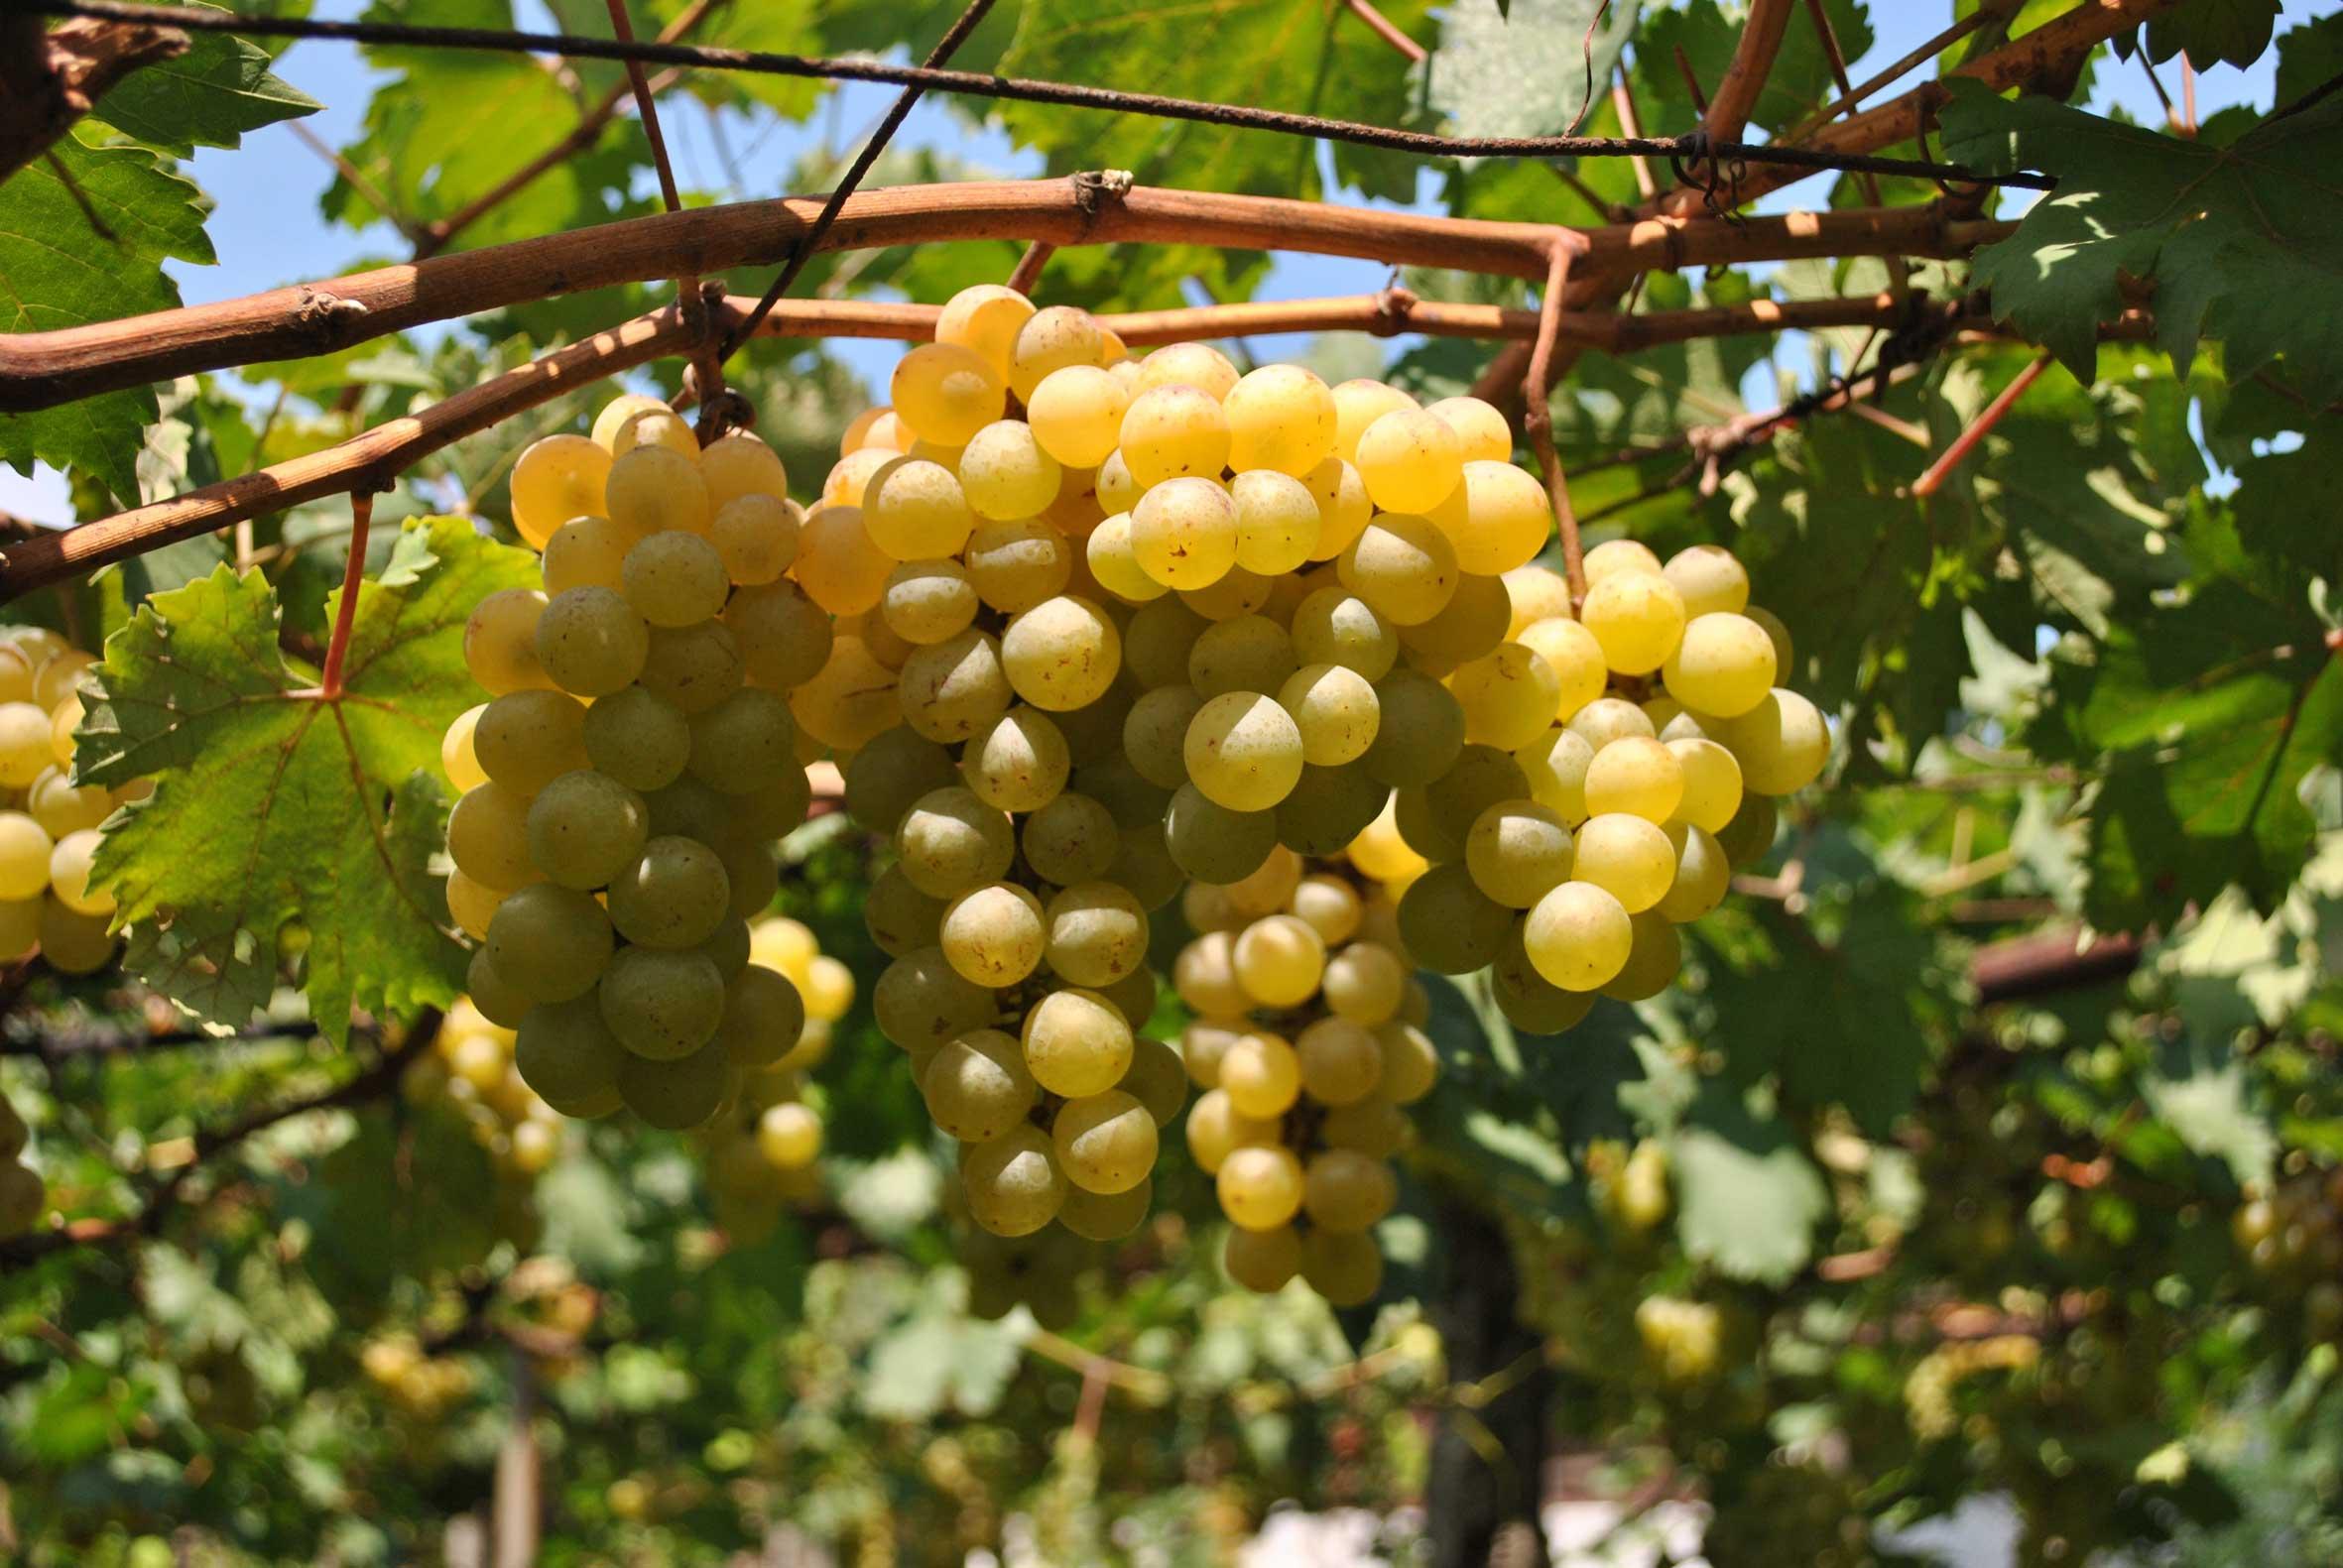 Anggur-banjarsari-a